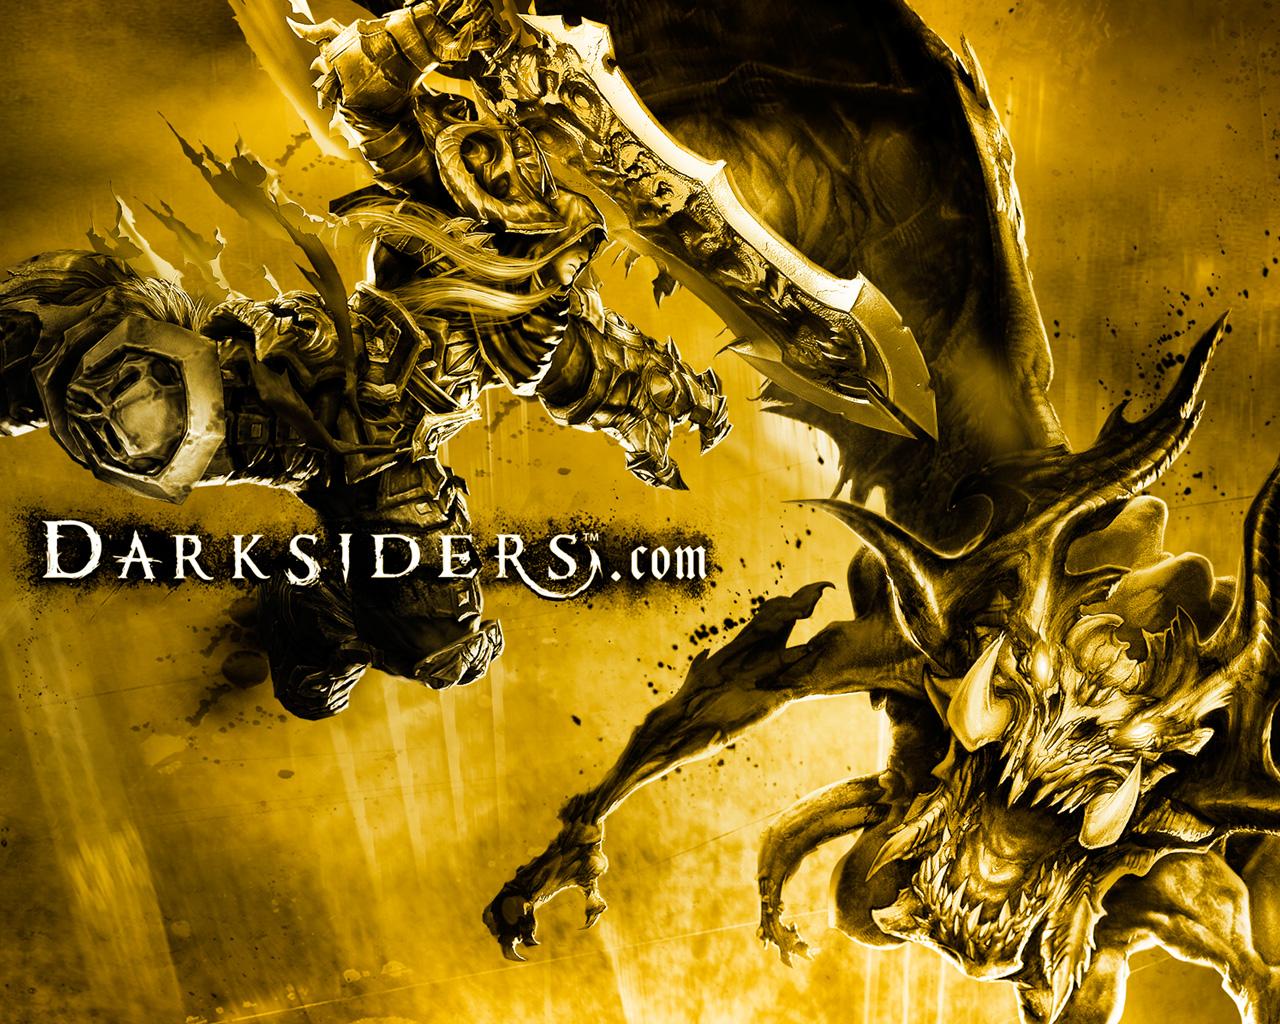 Darksiders Wallpaper in 1280x1024